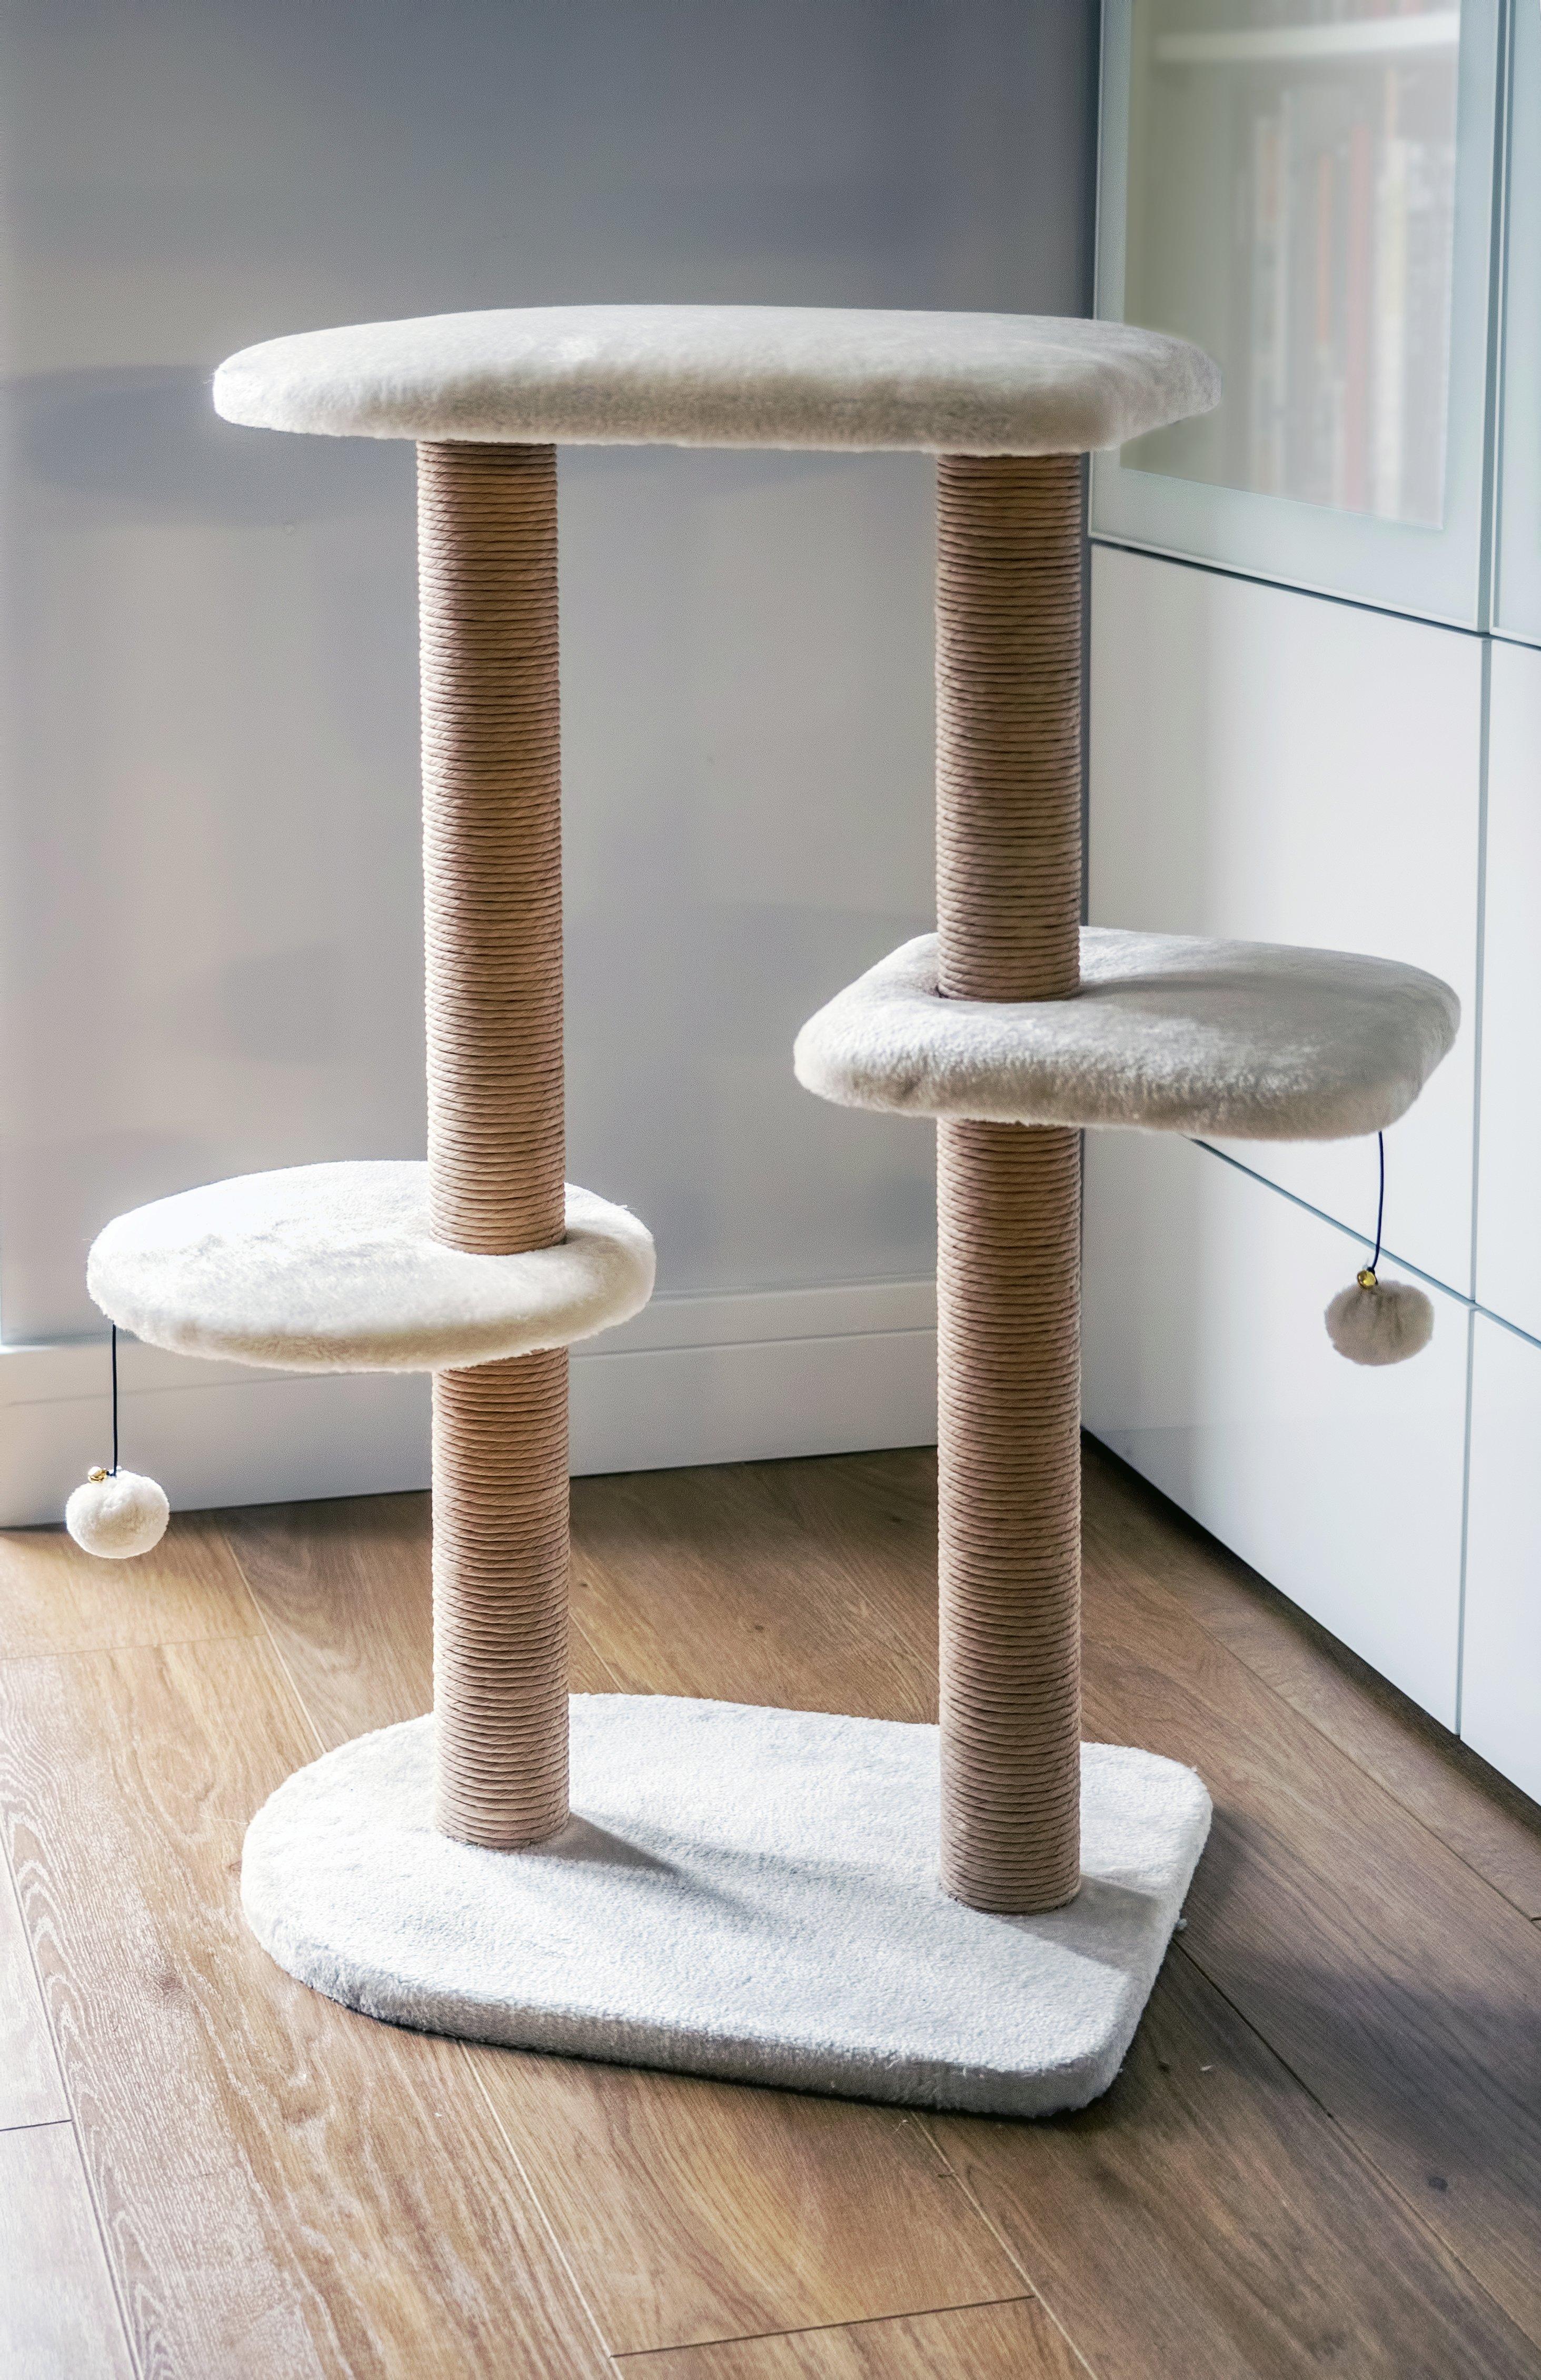 Petface Cat Multi-Tier Rest Station